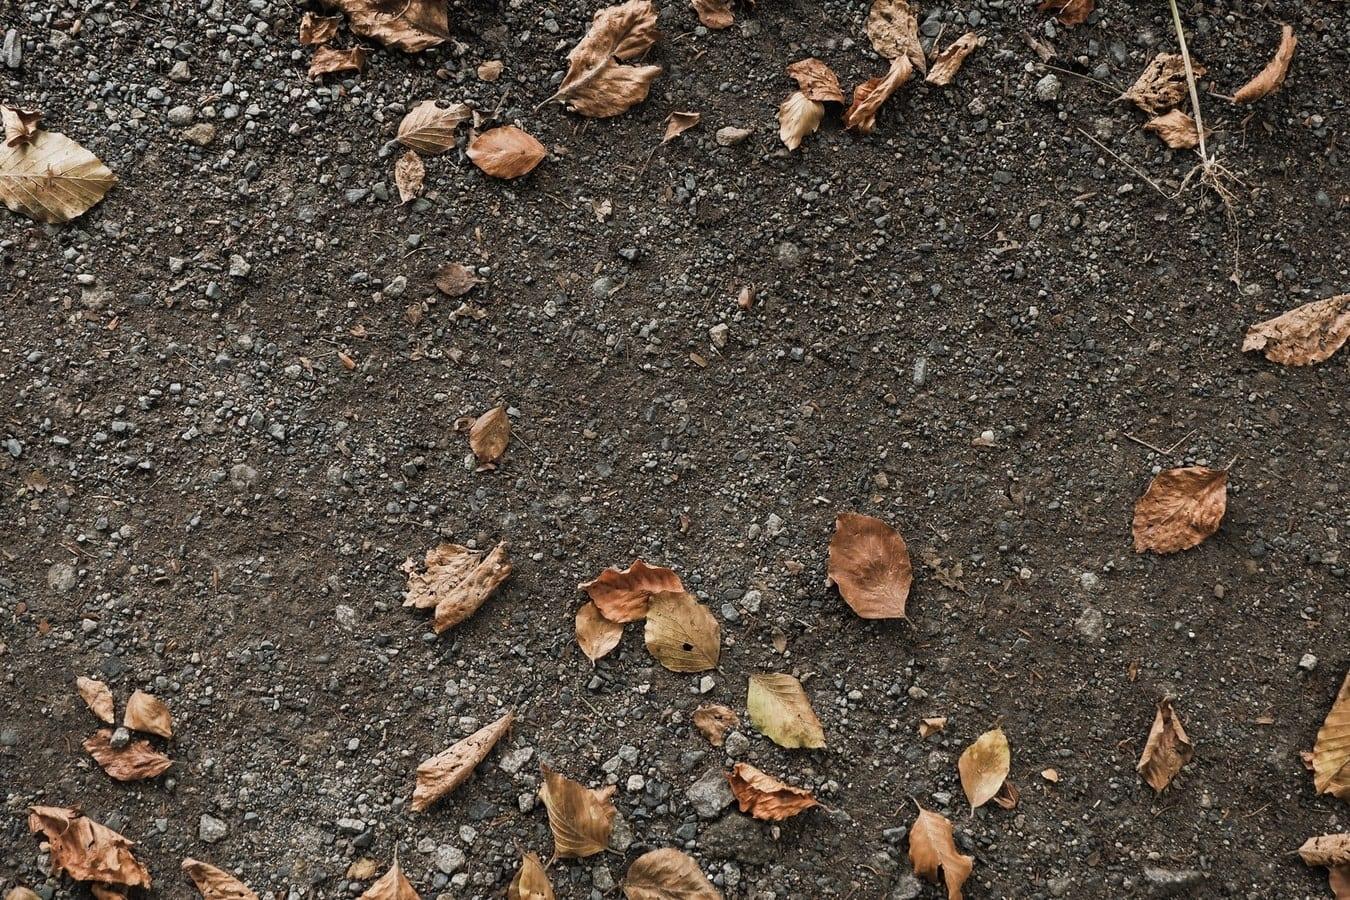 Schone grond verklaring kosten grond afvoeren verplicht